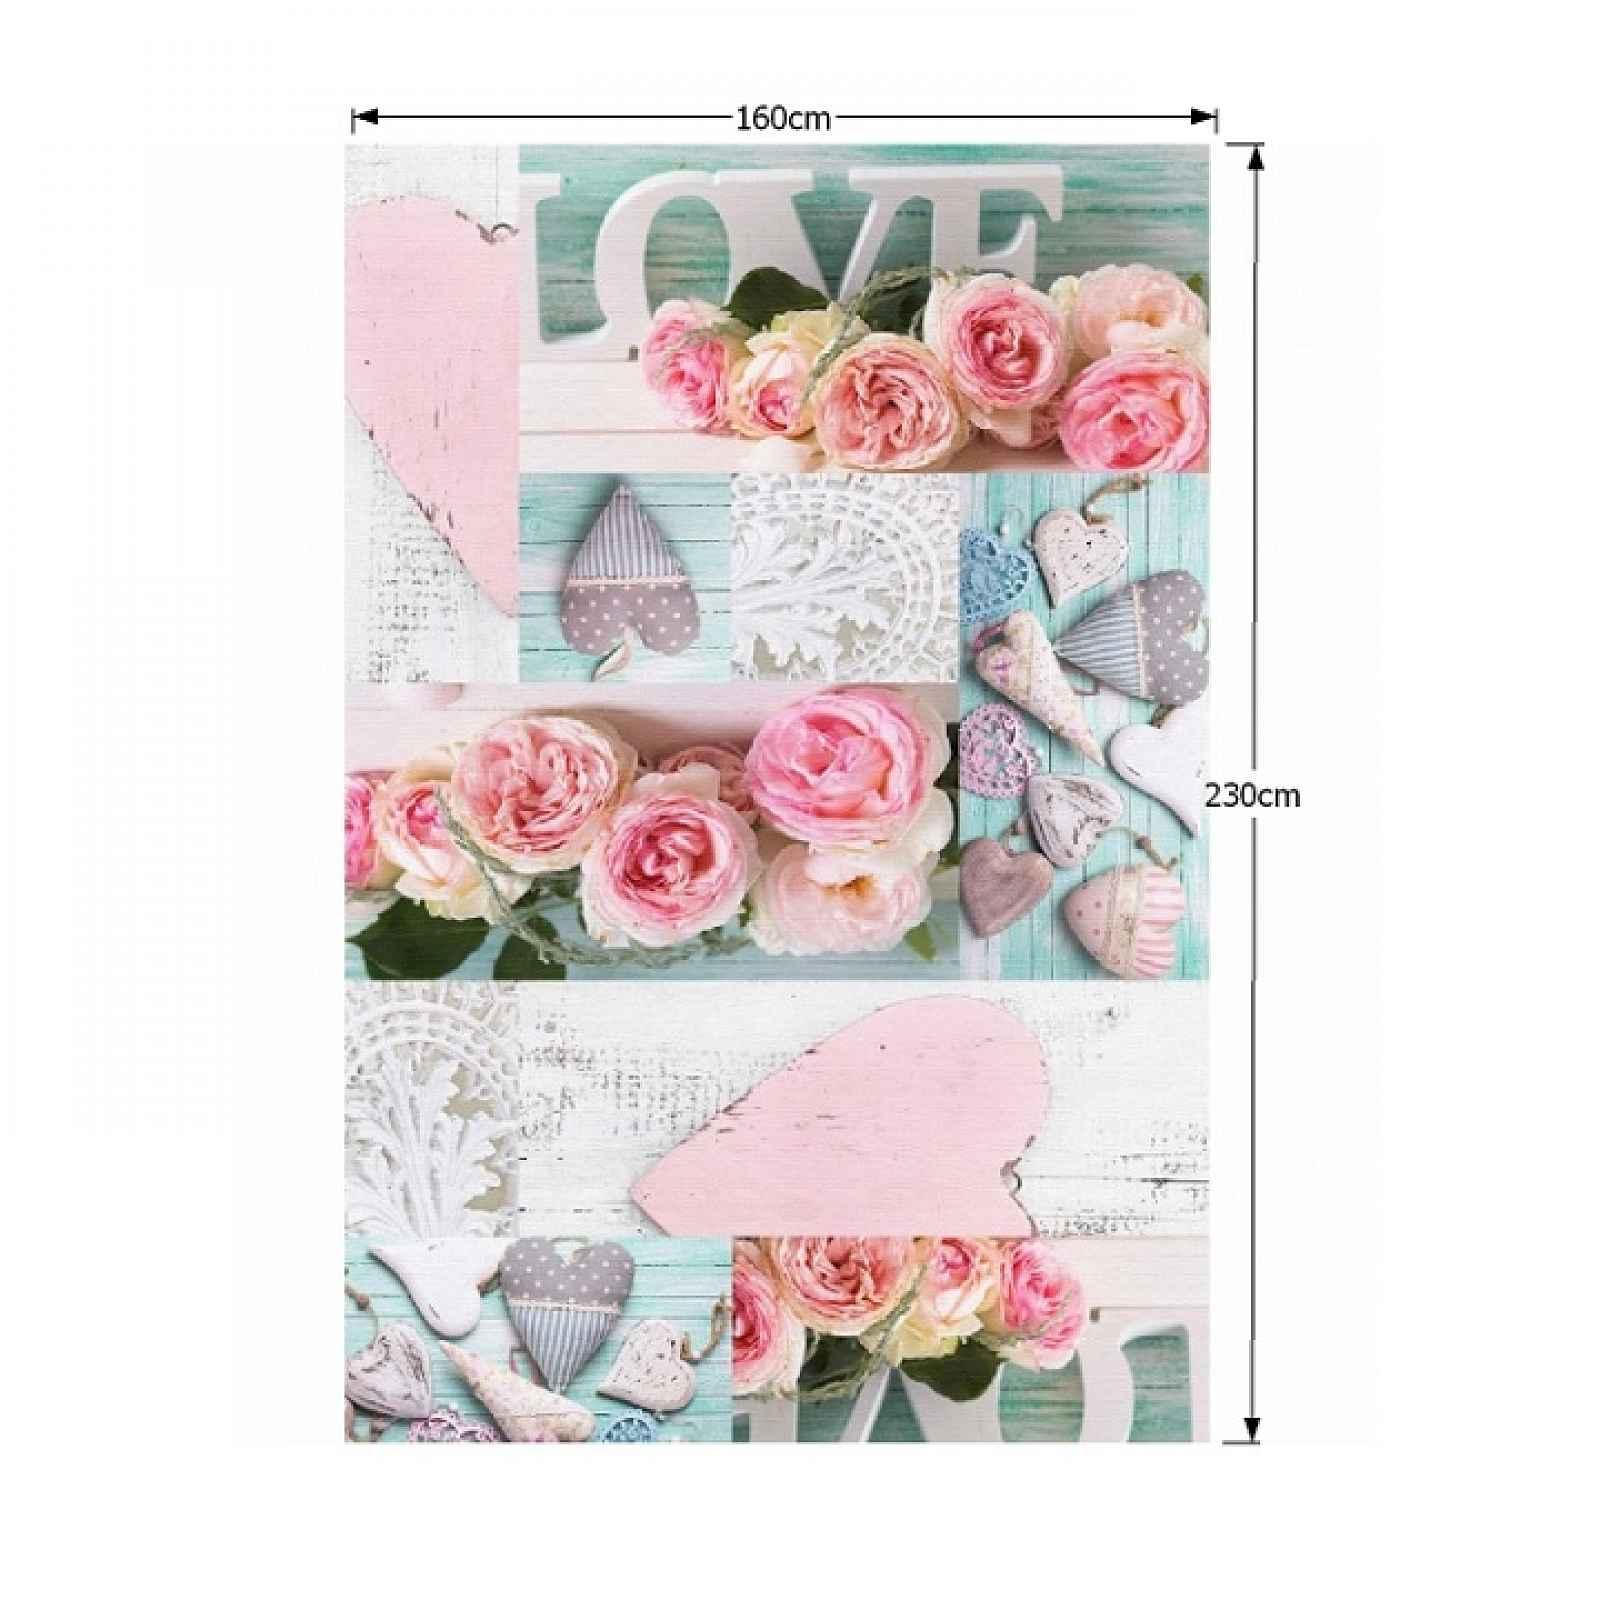 Koberec s třásněmi SONIL TYP 2 vzor růže Tempo Kondela 160x230 cm